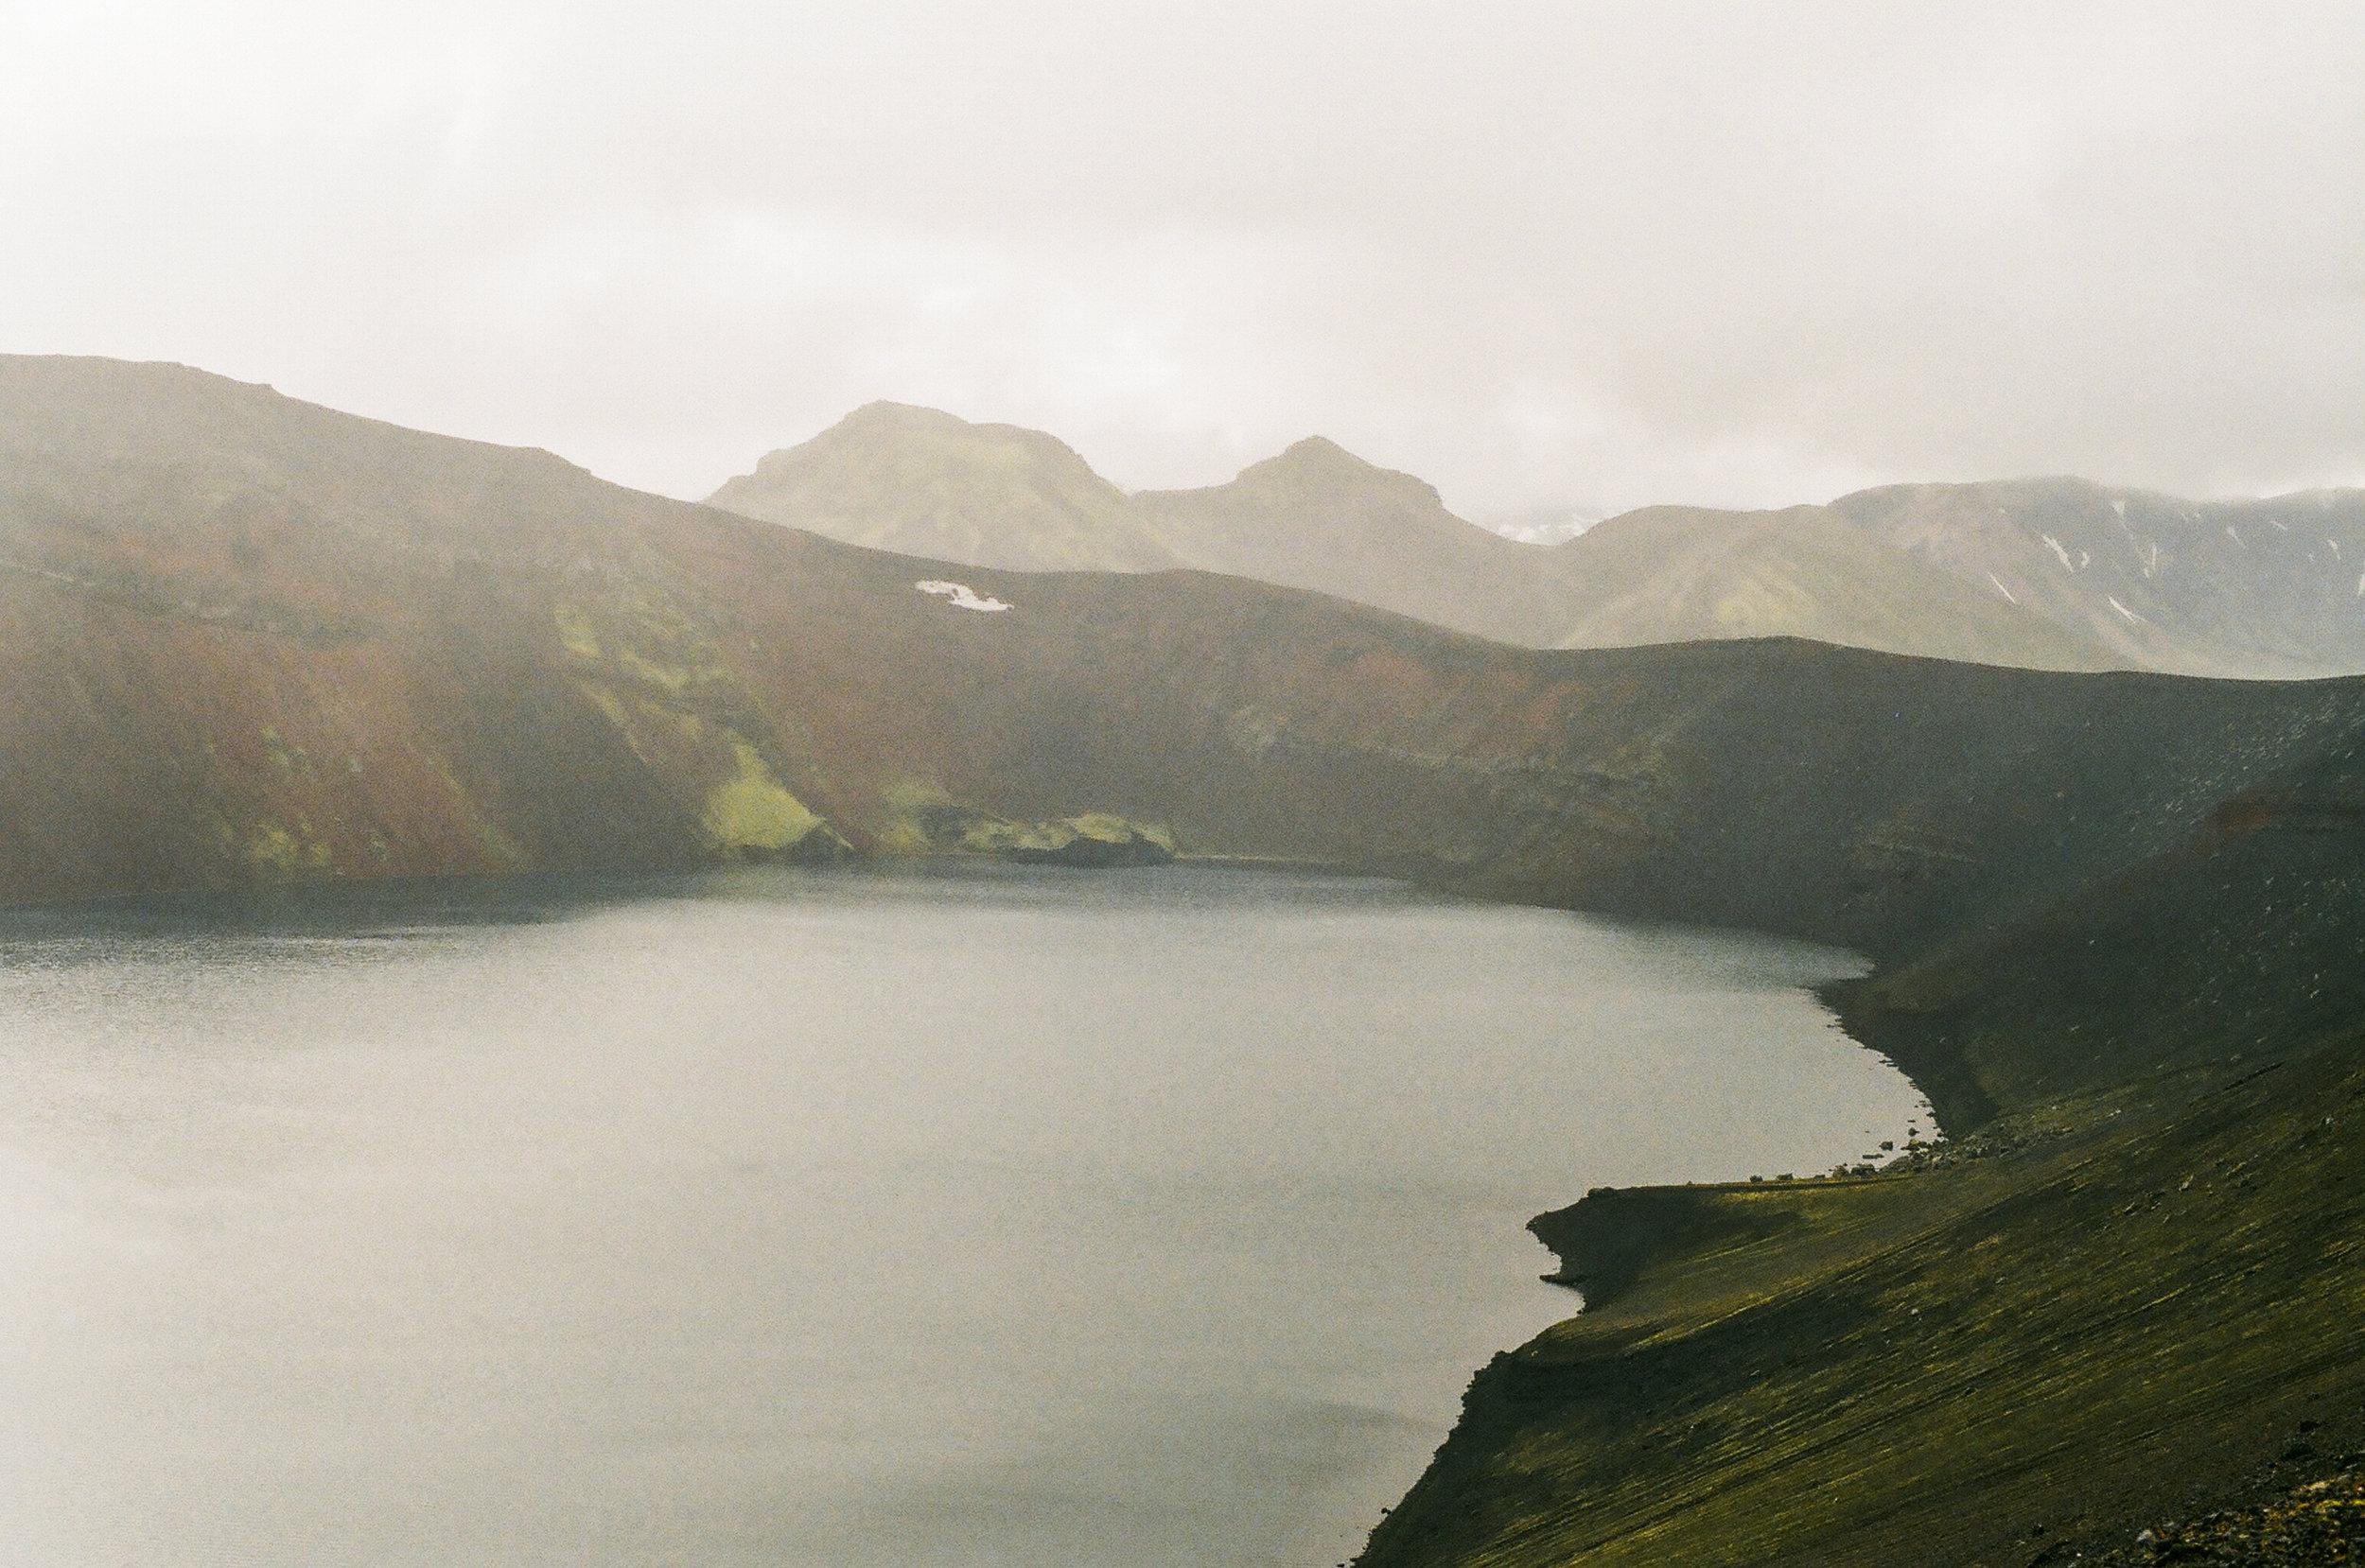 Iceland, 35mm, 2015